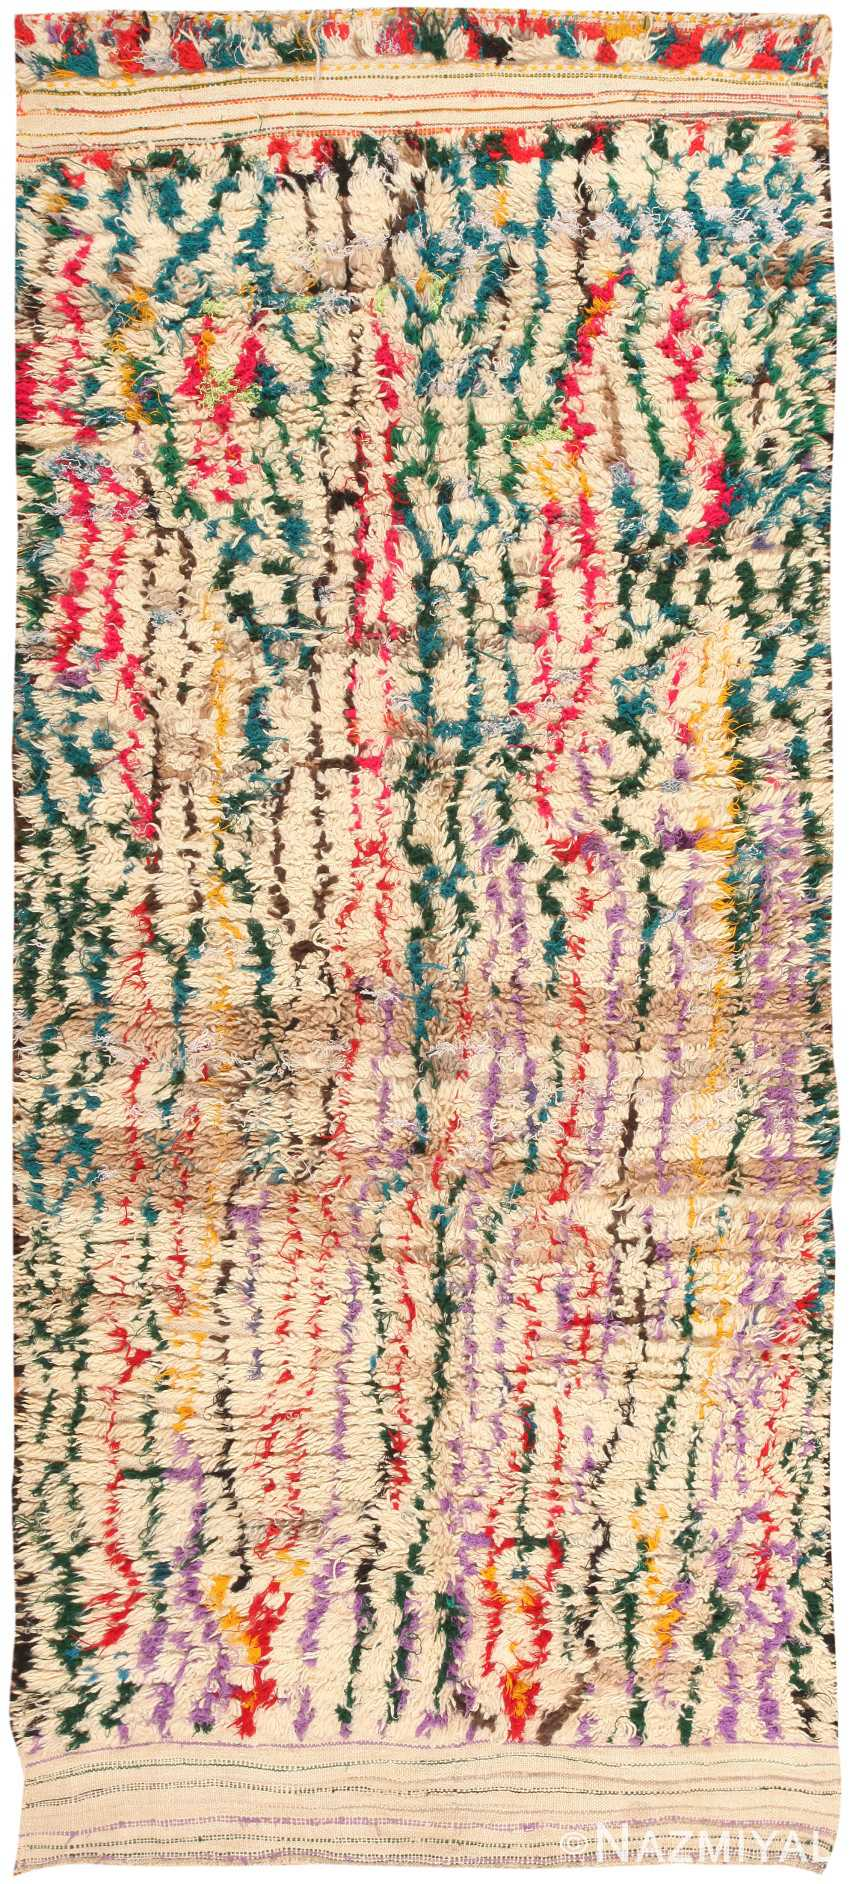 Vintage Moroccan Rug 47216 Detail/Large View